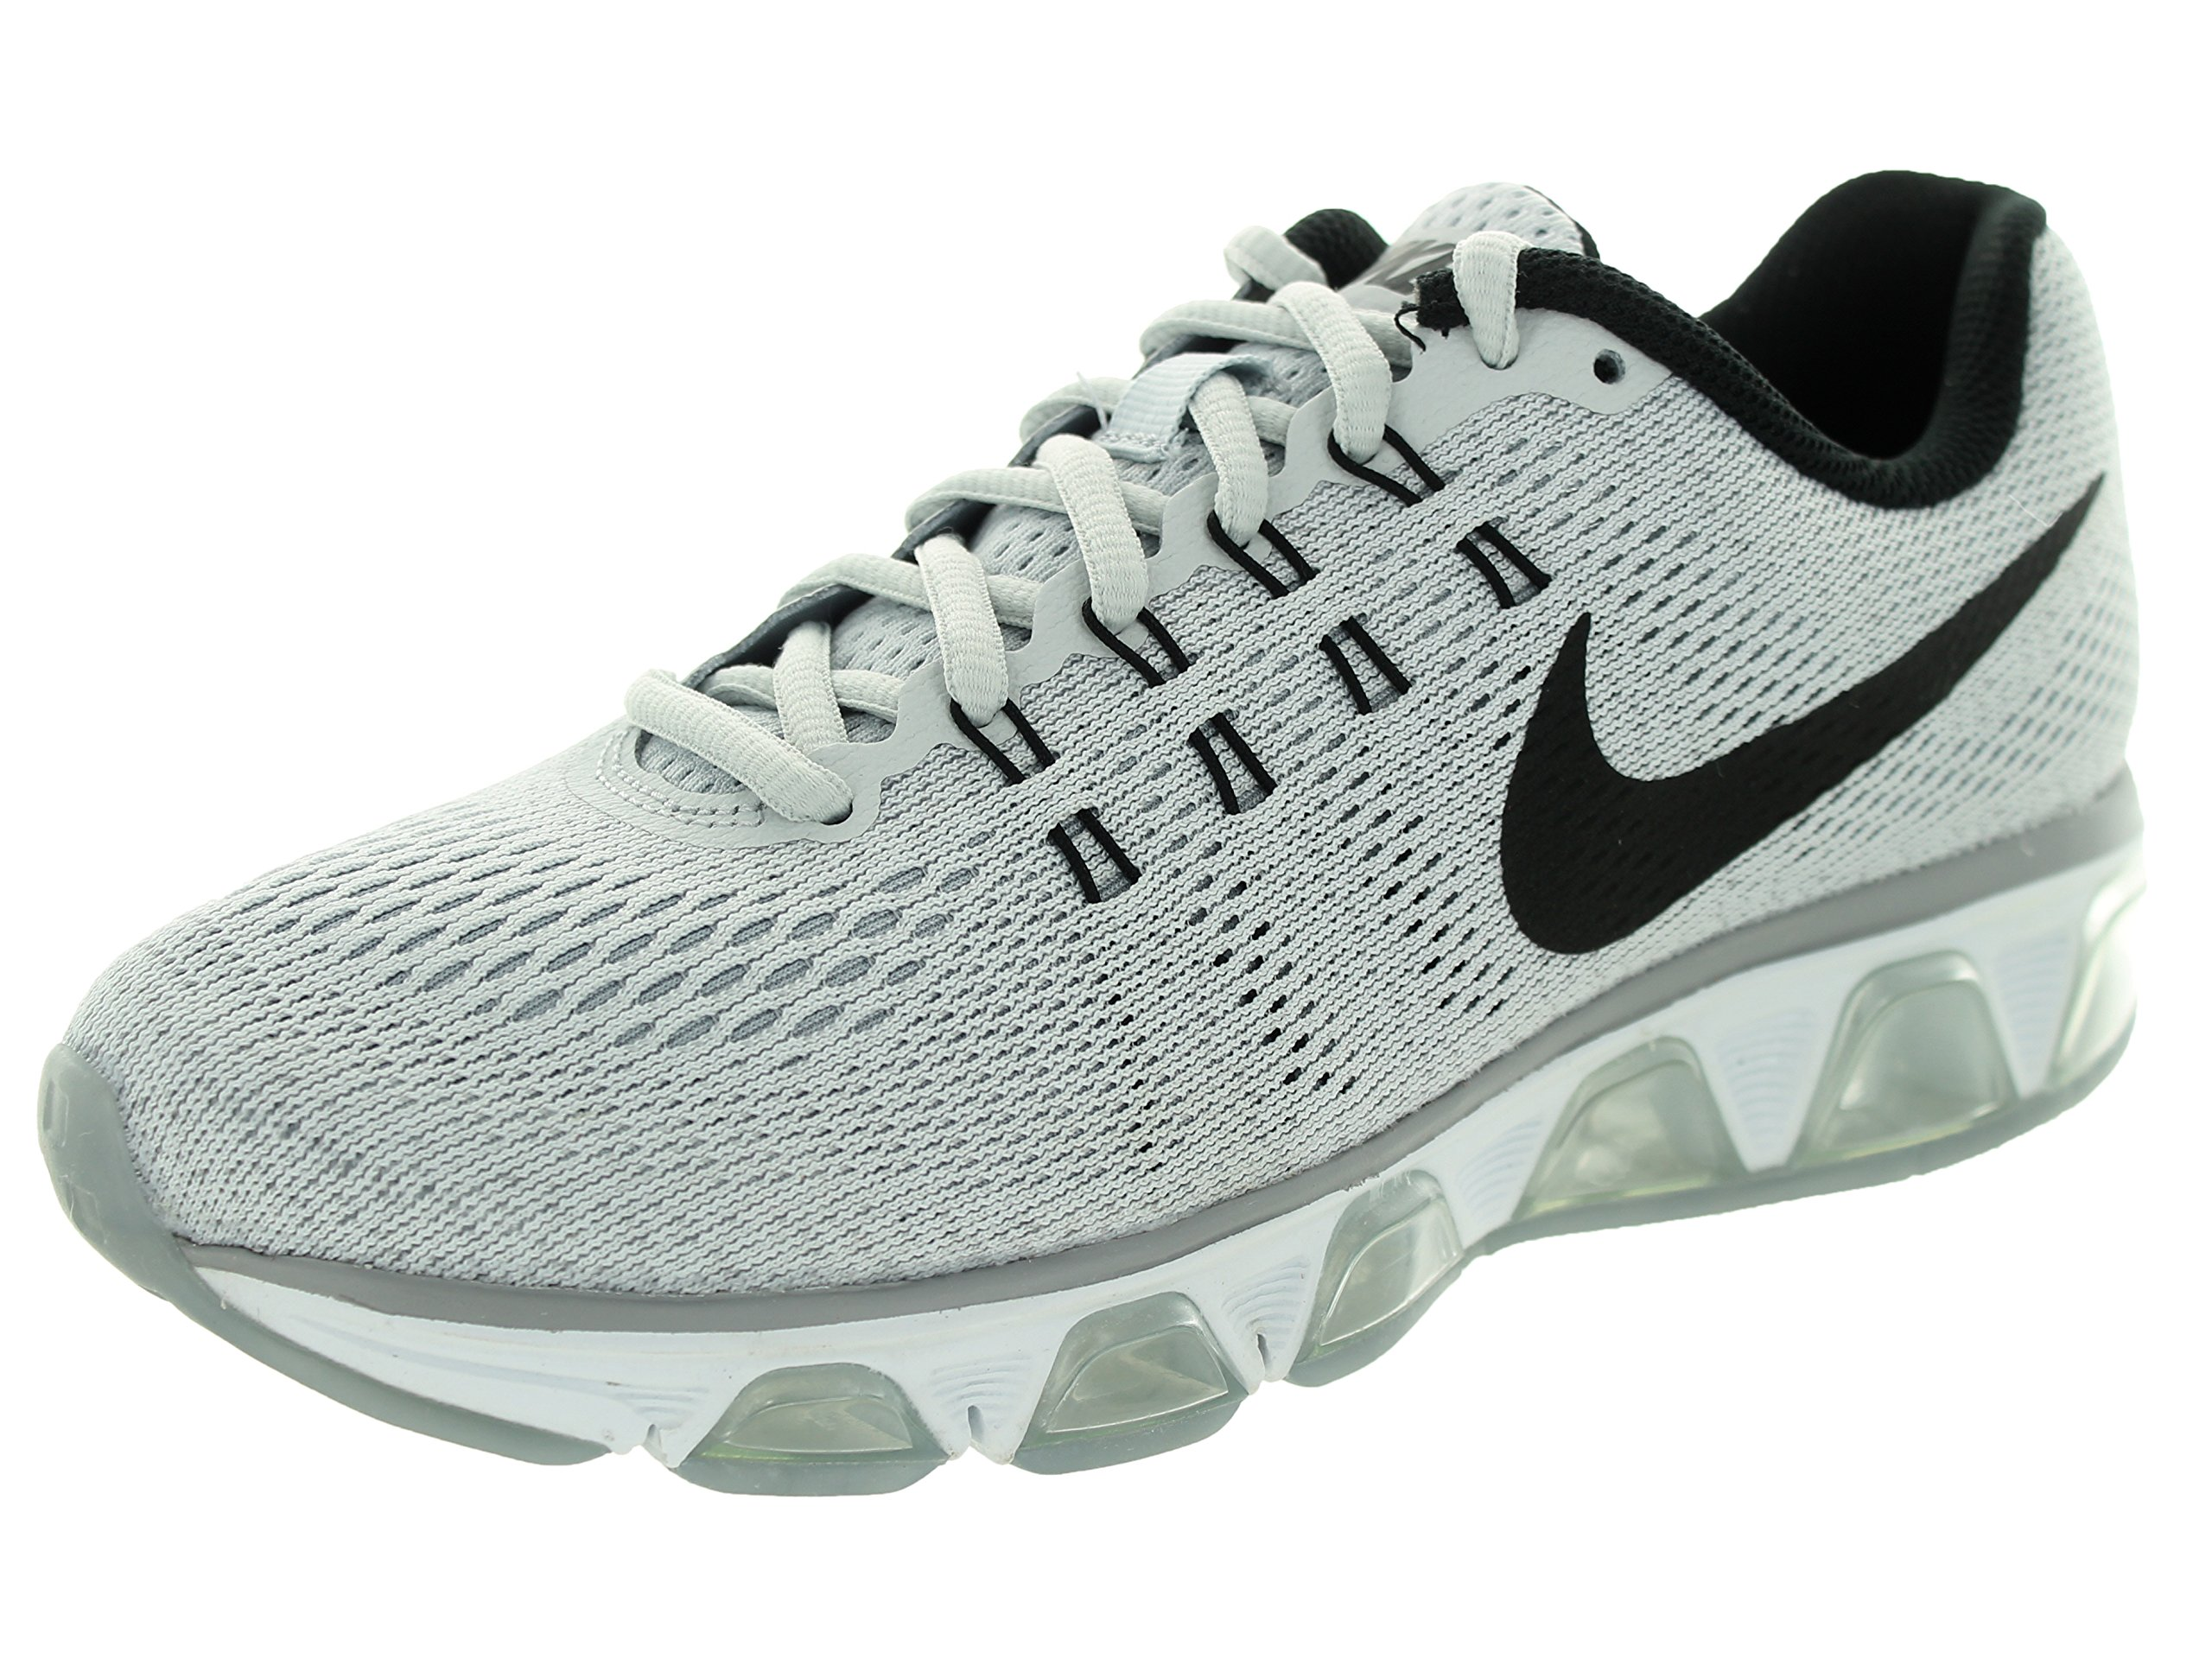 timeless design a3974 58478 Galleon - Nike Women s Air Max Tailwind 8 Pure Platinum Blck Wlf Gry Wht  Running Shoe 10 Women US